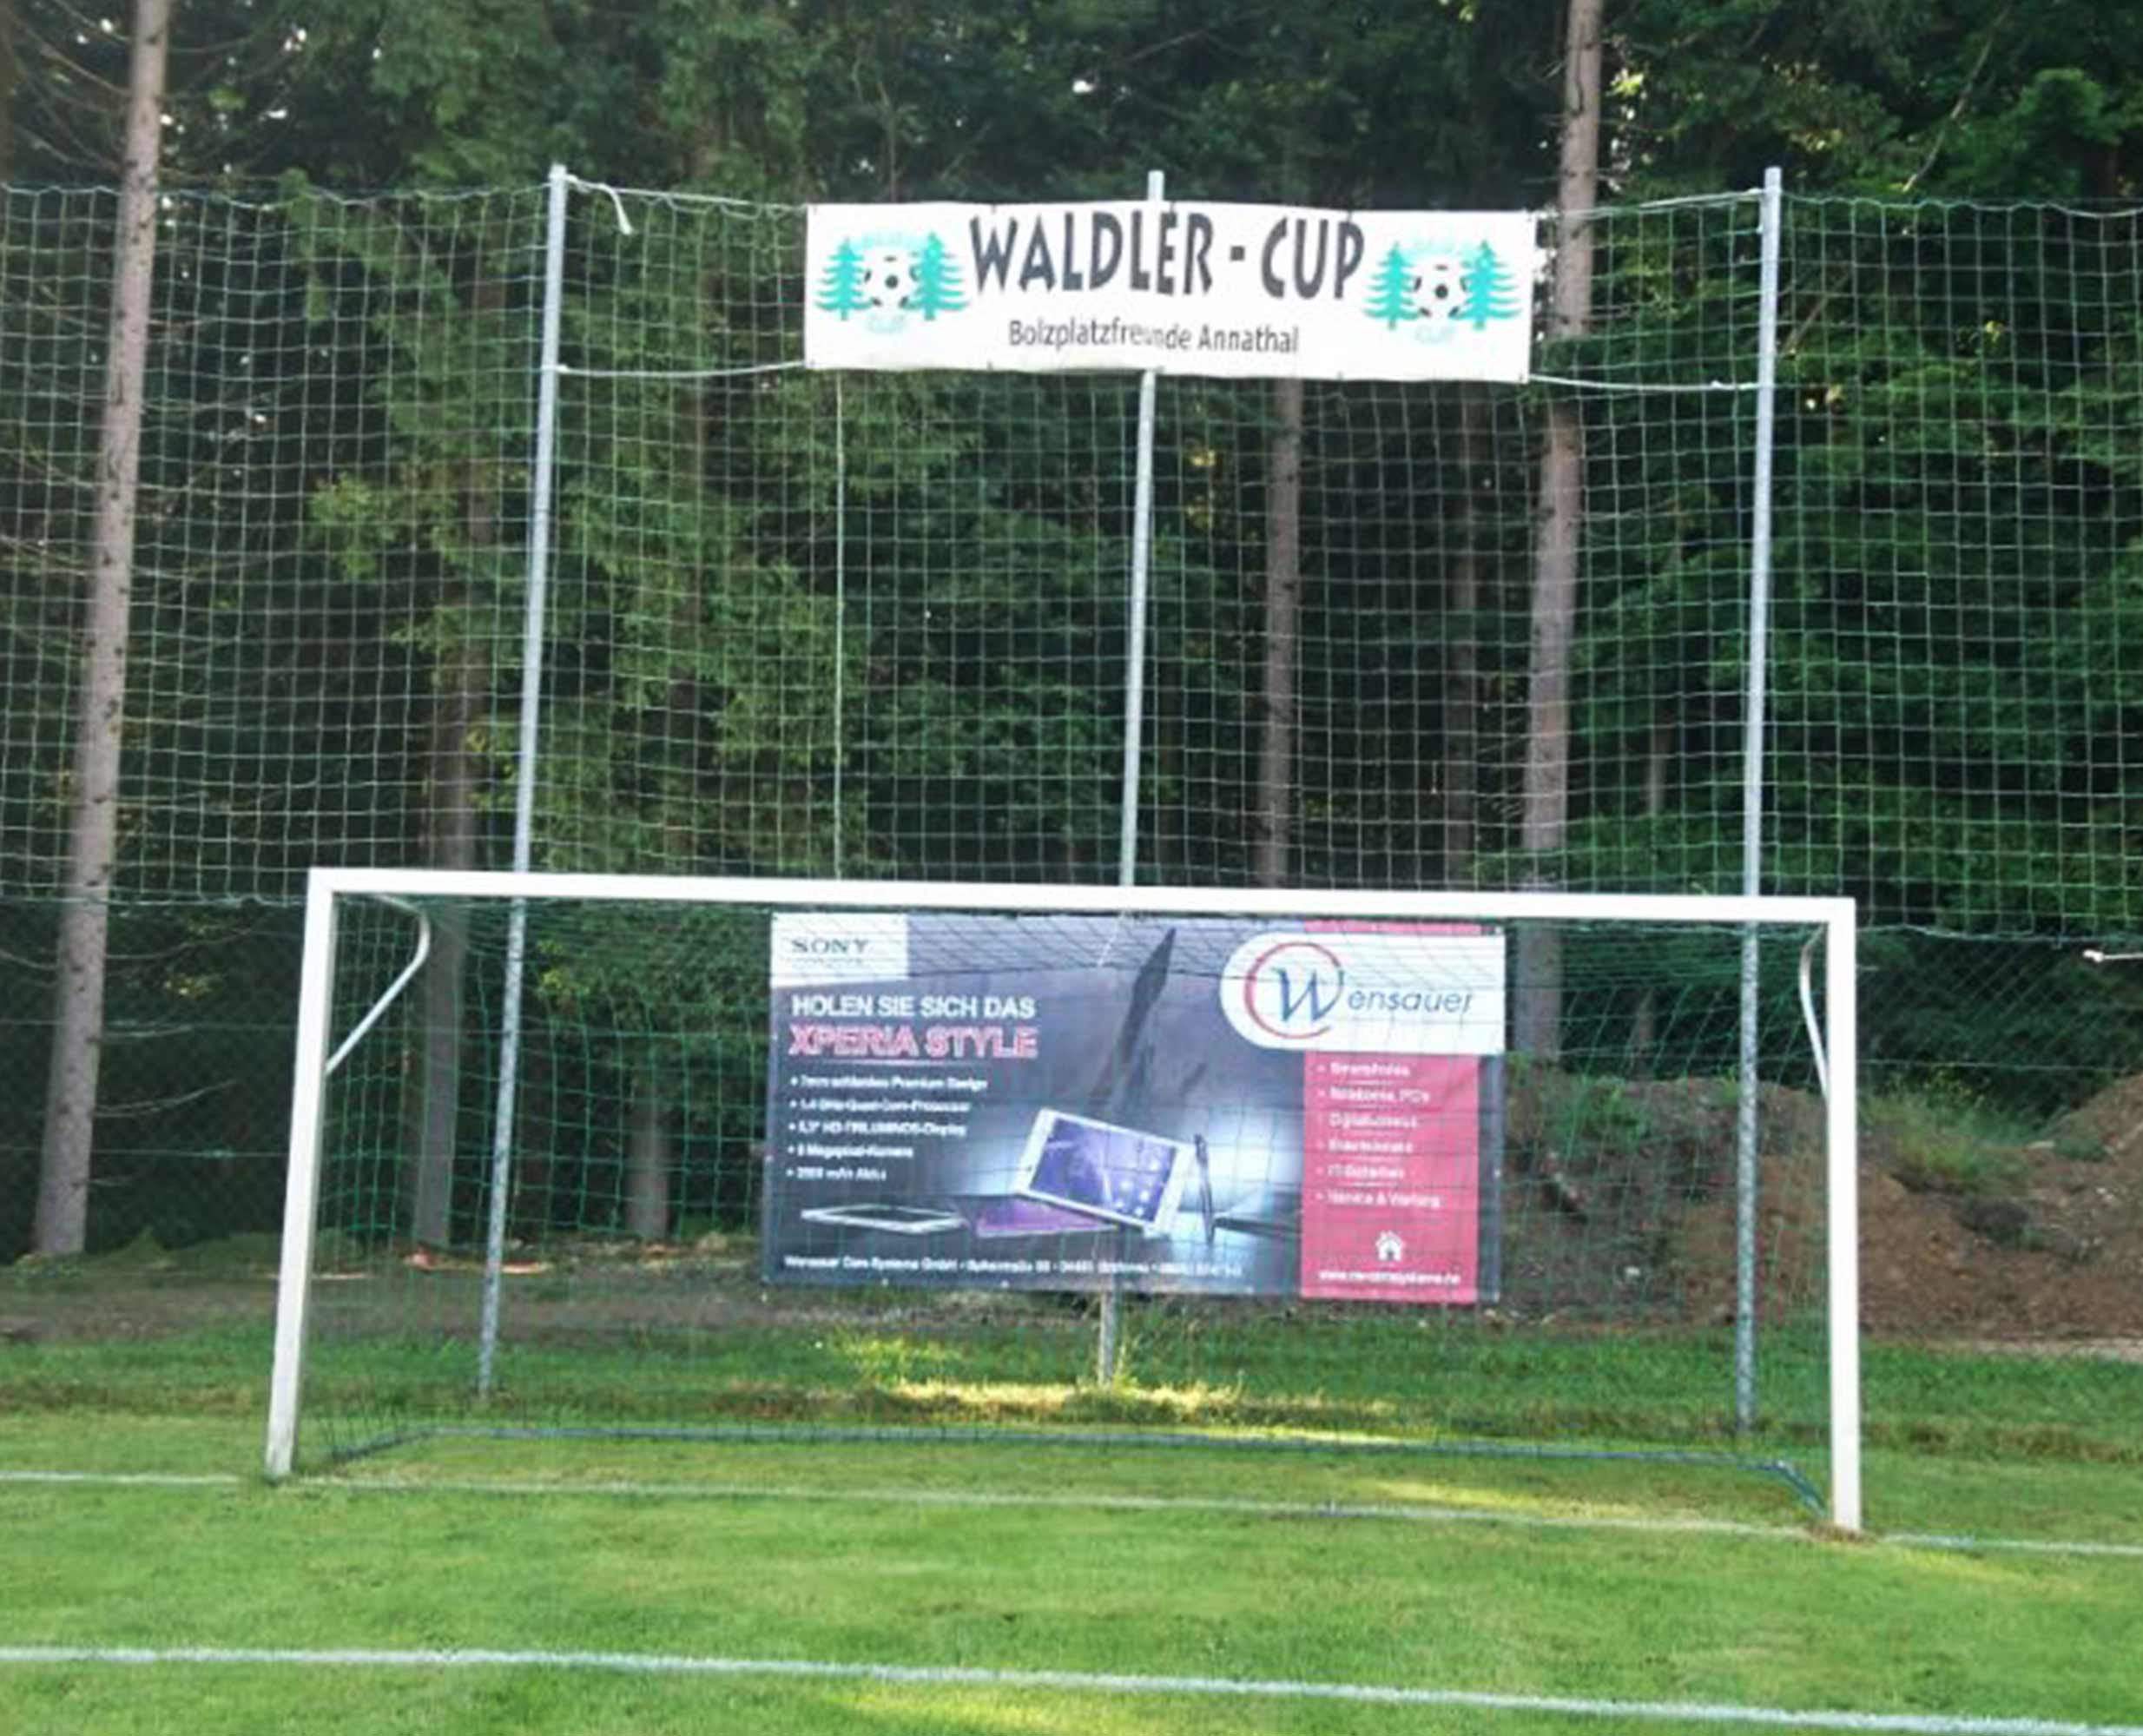 Waldler-Cup, Bolzplatzfreunde Annathal - Wensauer Com-Systeme GmbH